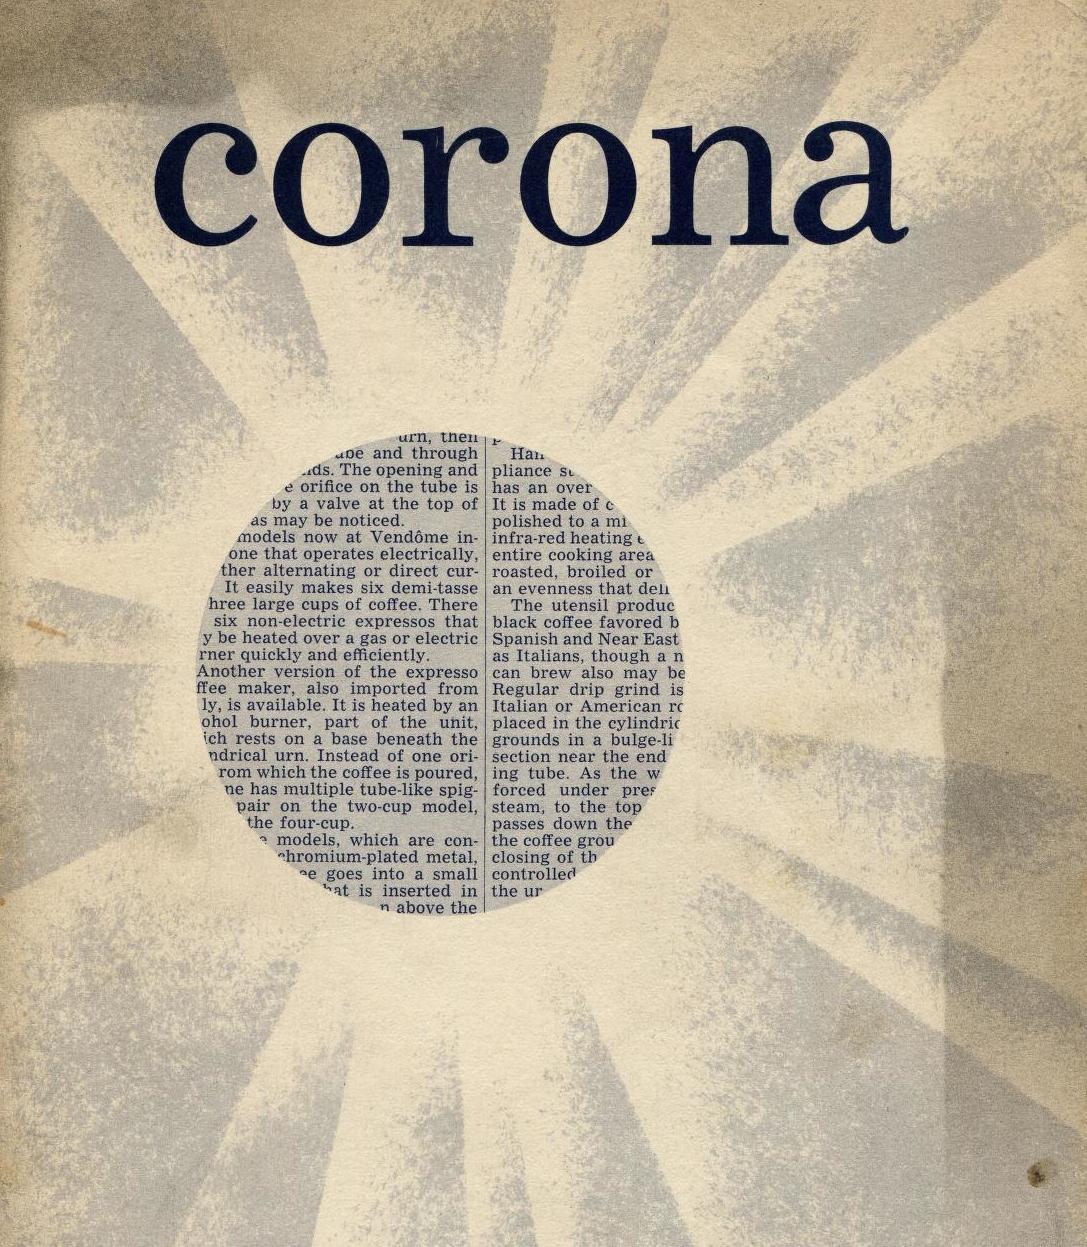 mlc-corona-312-19-J-PP-23X-1951-0600rgbjpg_0000